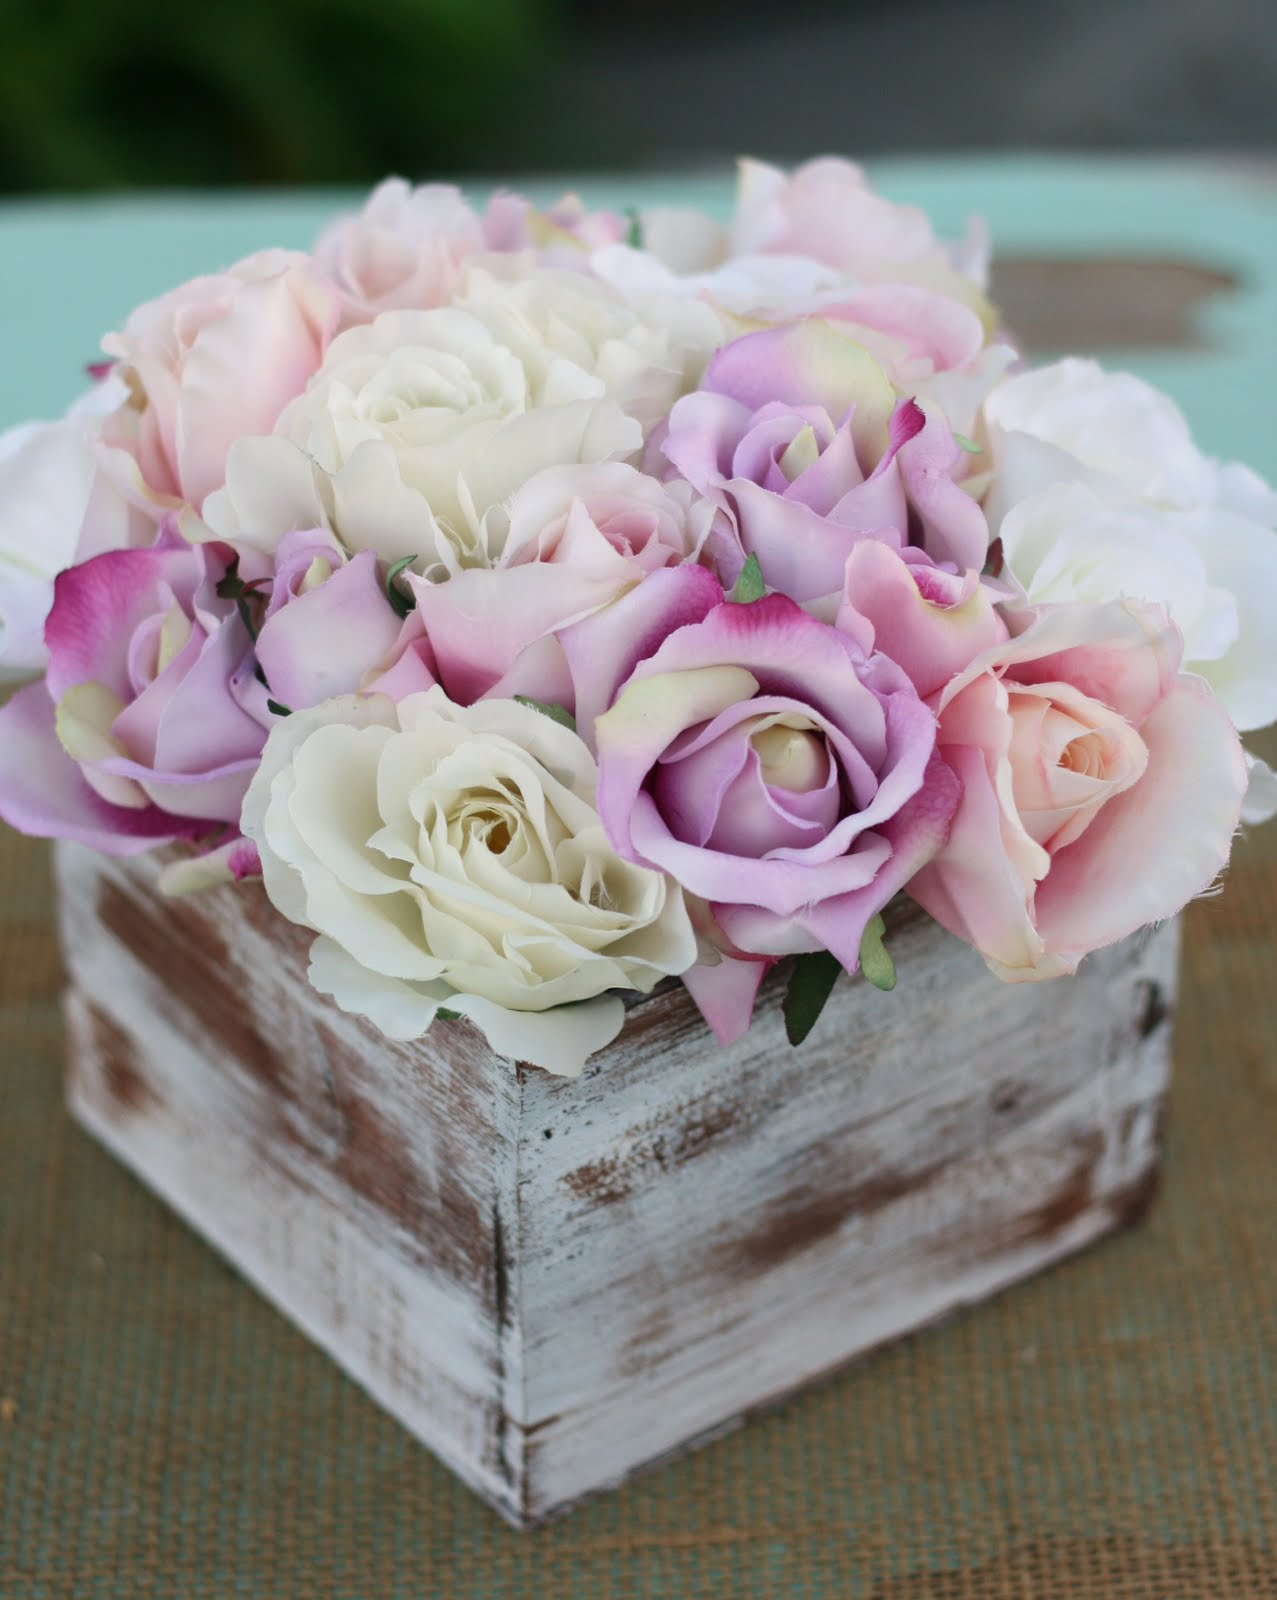 Morgann Hill Designs Shabby Chic Rustic Flower Bouquet Wedding Centerpiece Arrangement